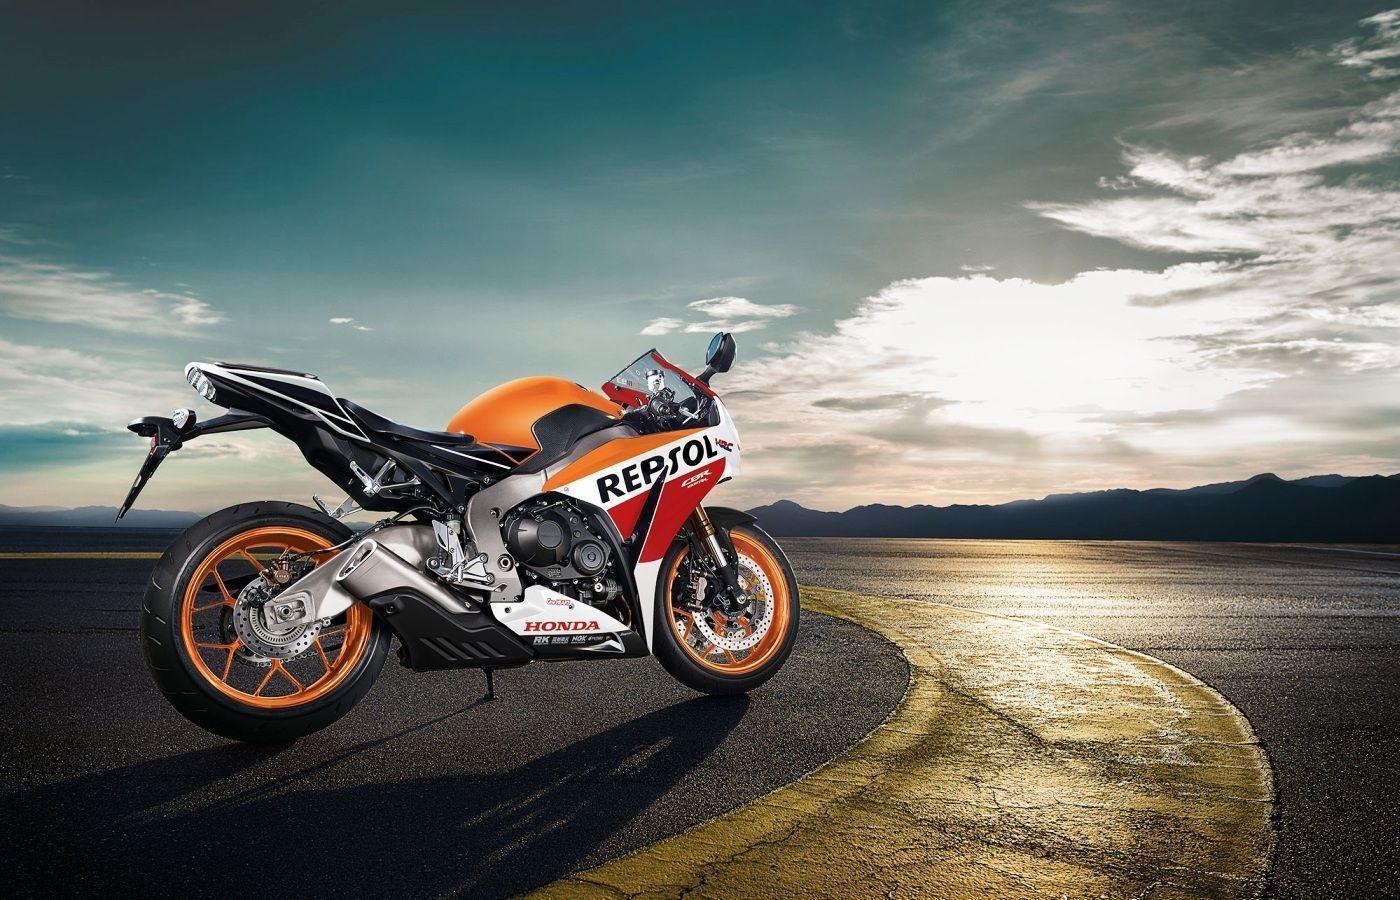 cruiser motorcycle wallpaper hd - photo #44